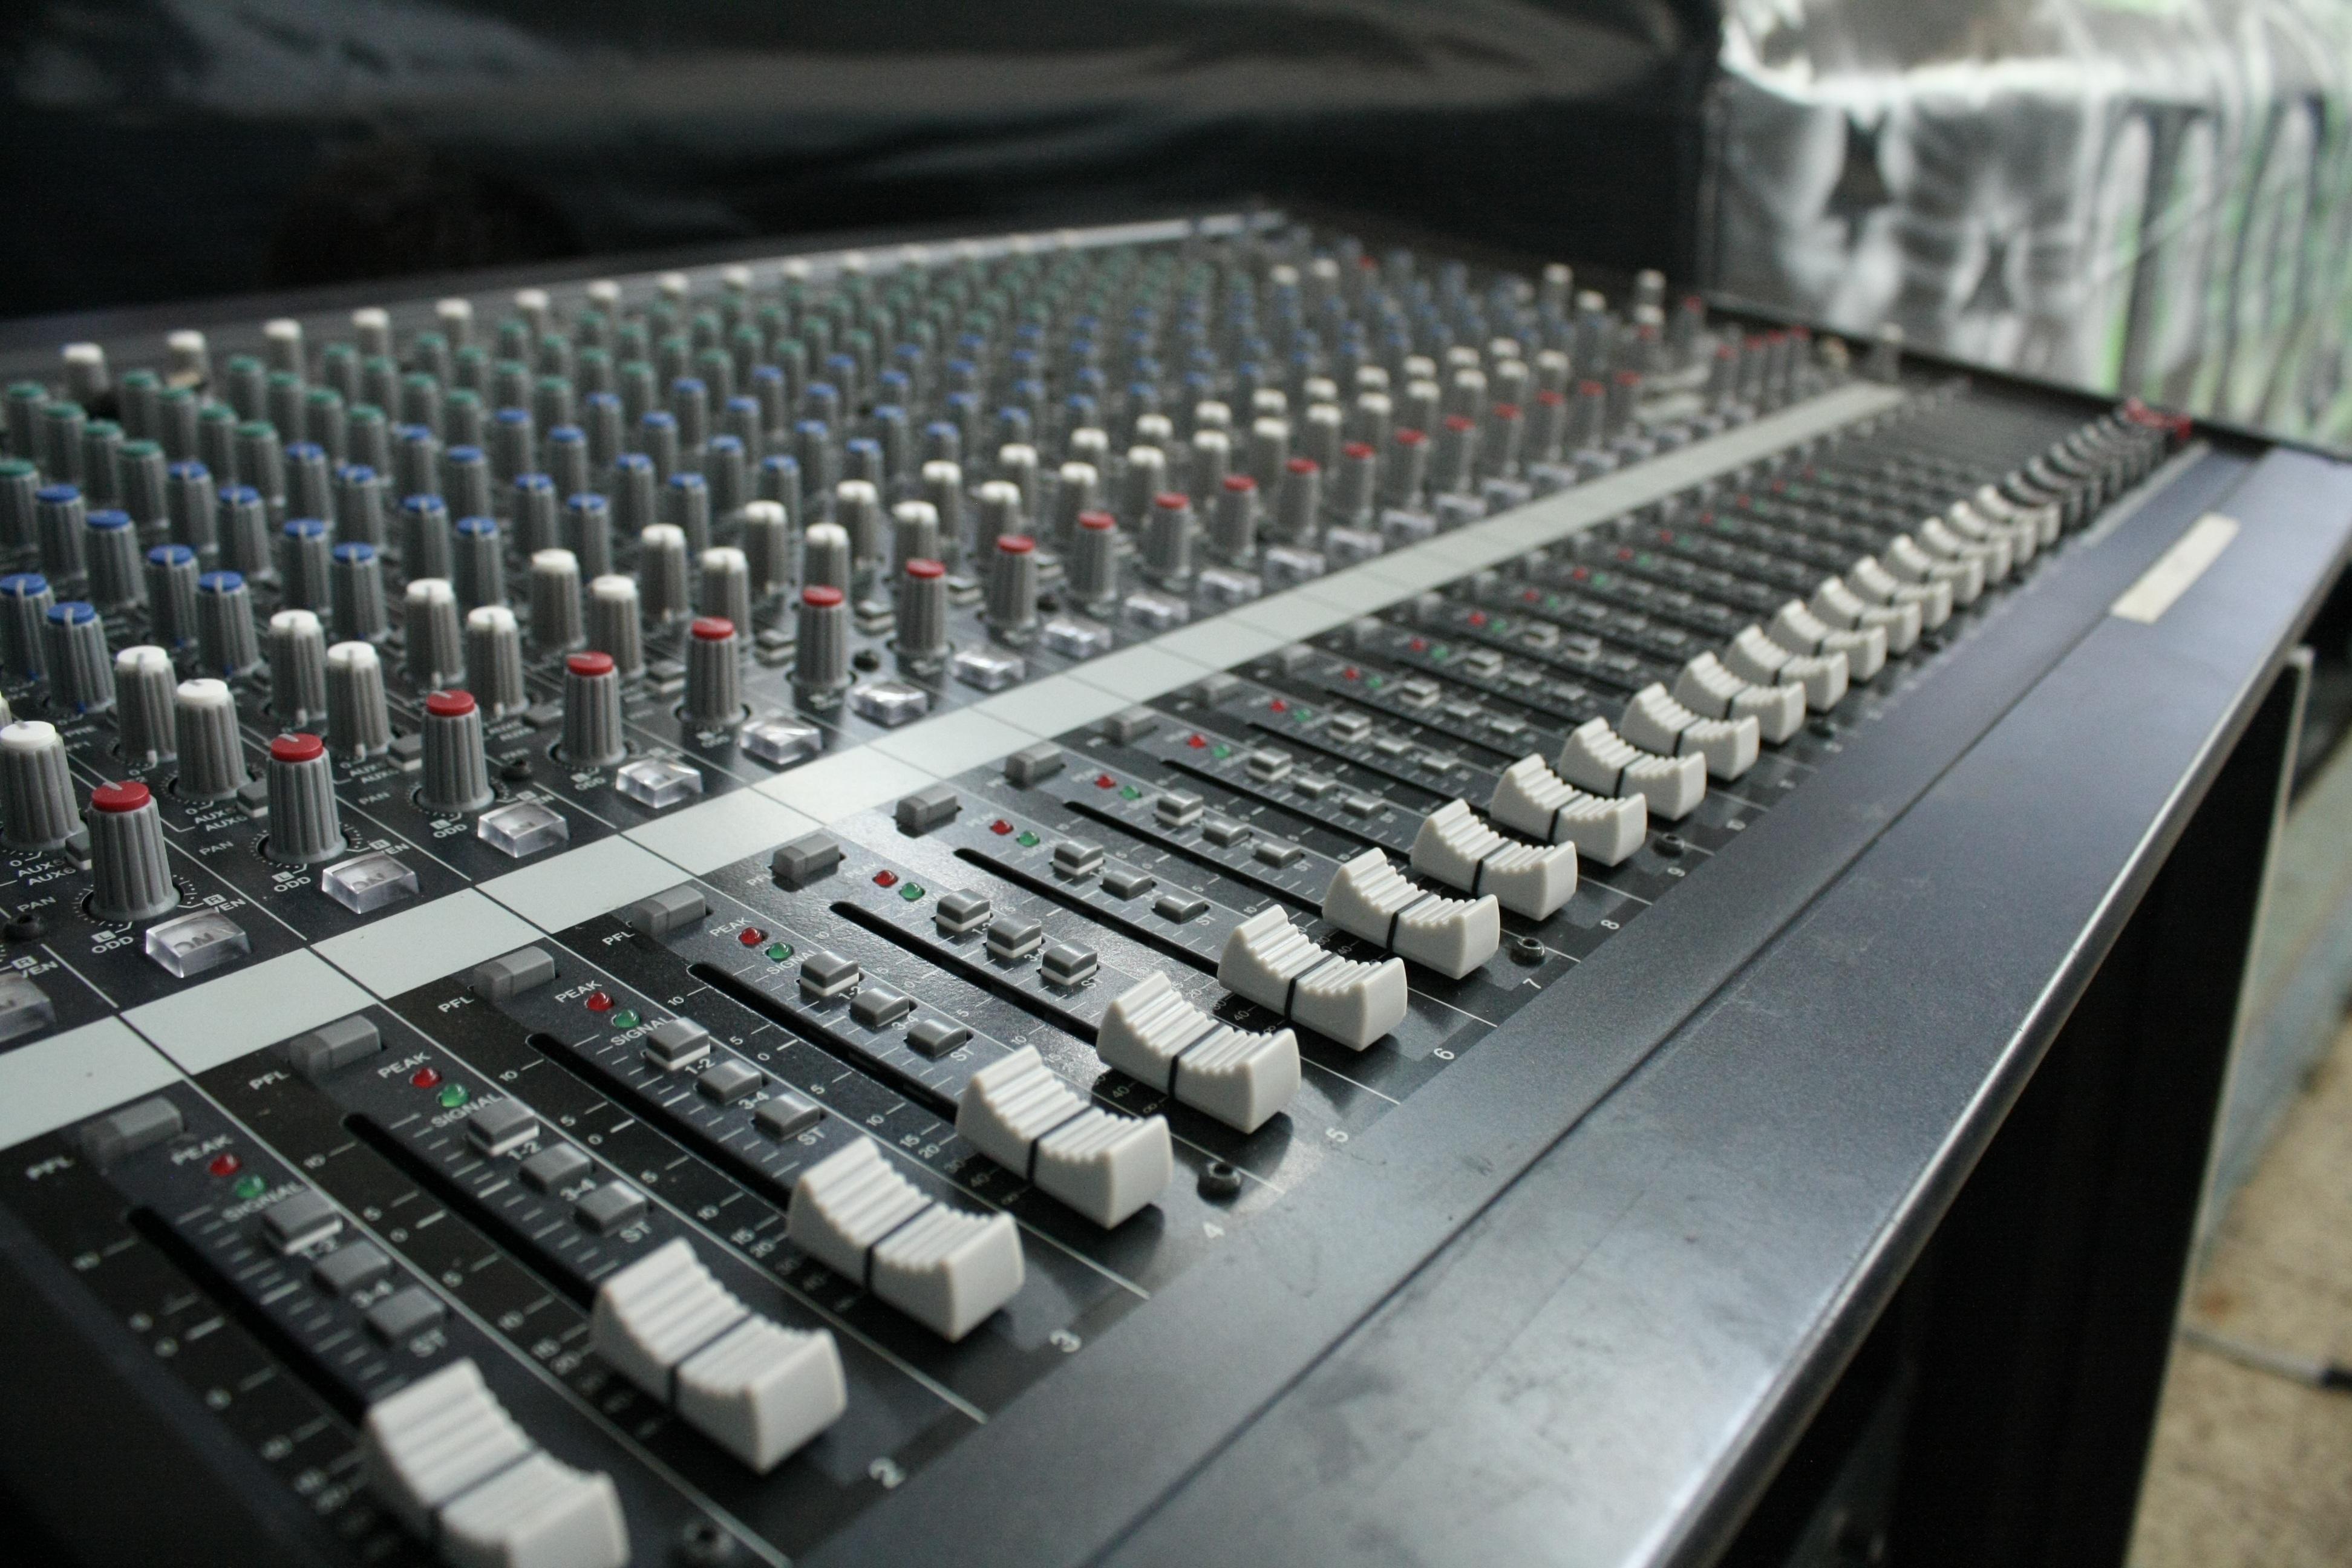 Mix Audio to Video, Video Mixer, Join Convert mix